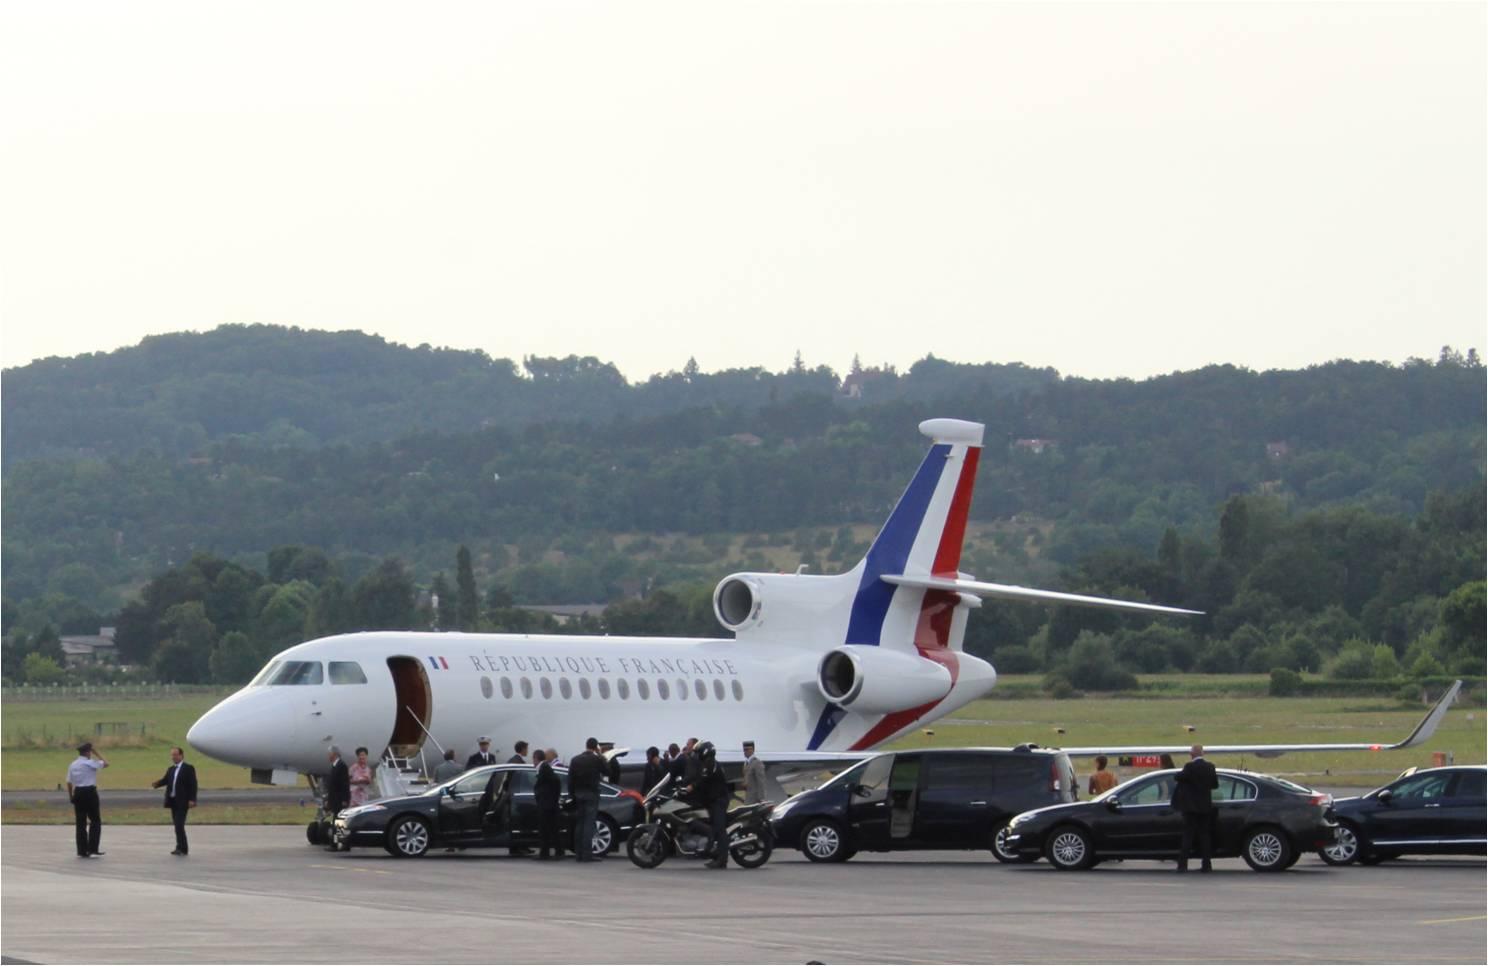 [Image: embarquement-c3a0-bord-de-lavion-prc3a9sidentiel.jpg]